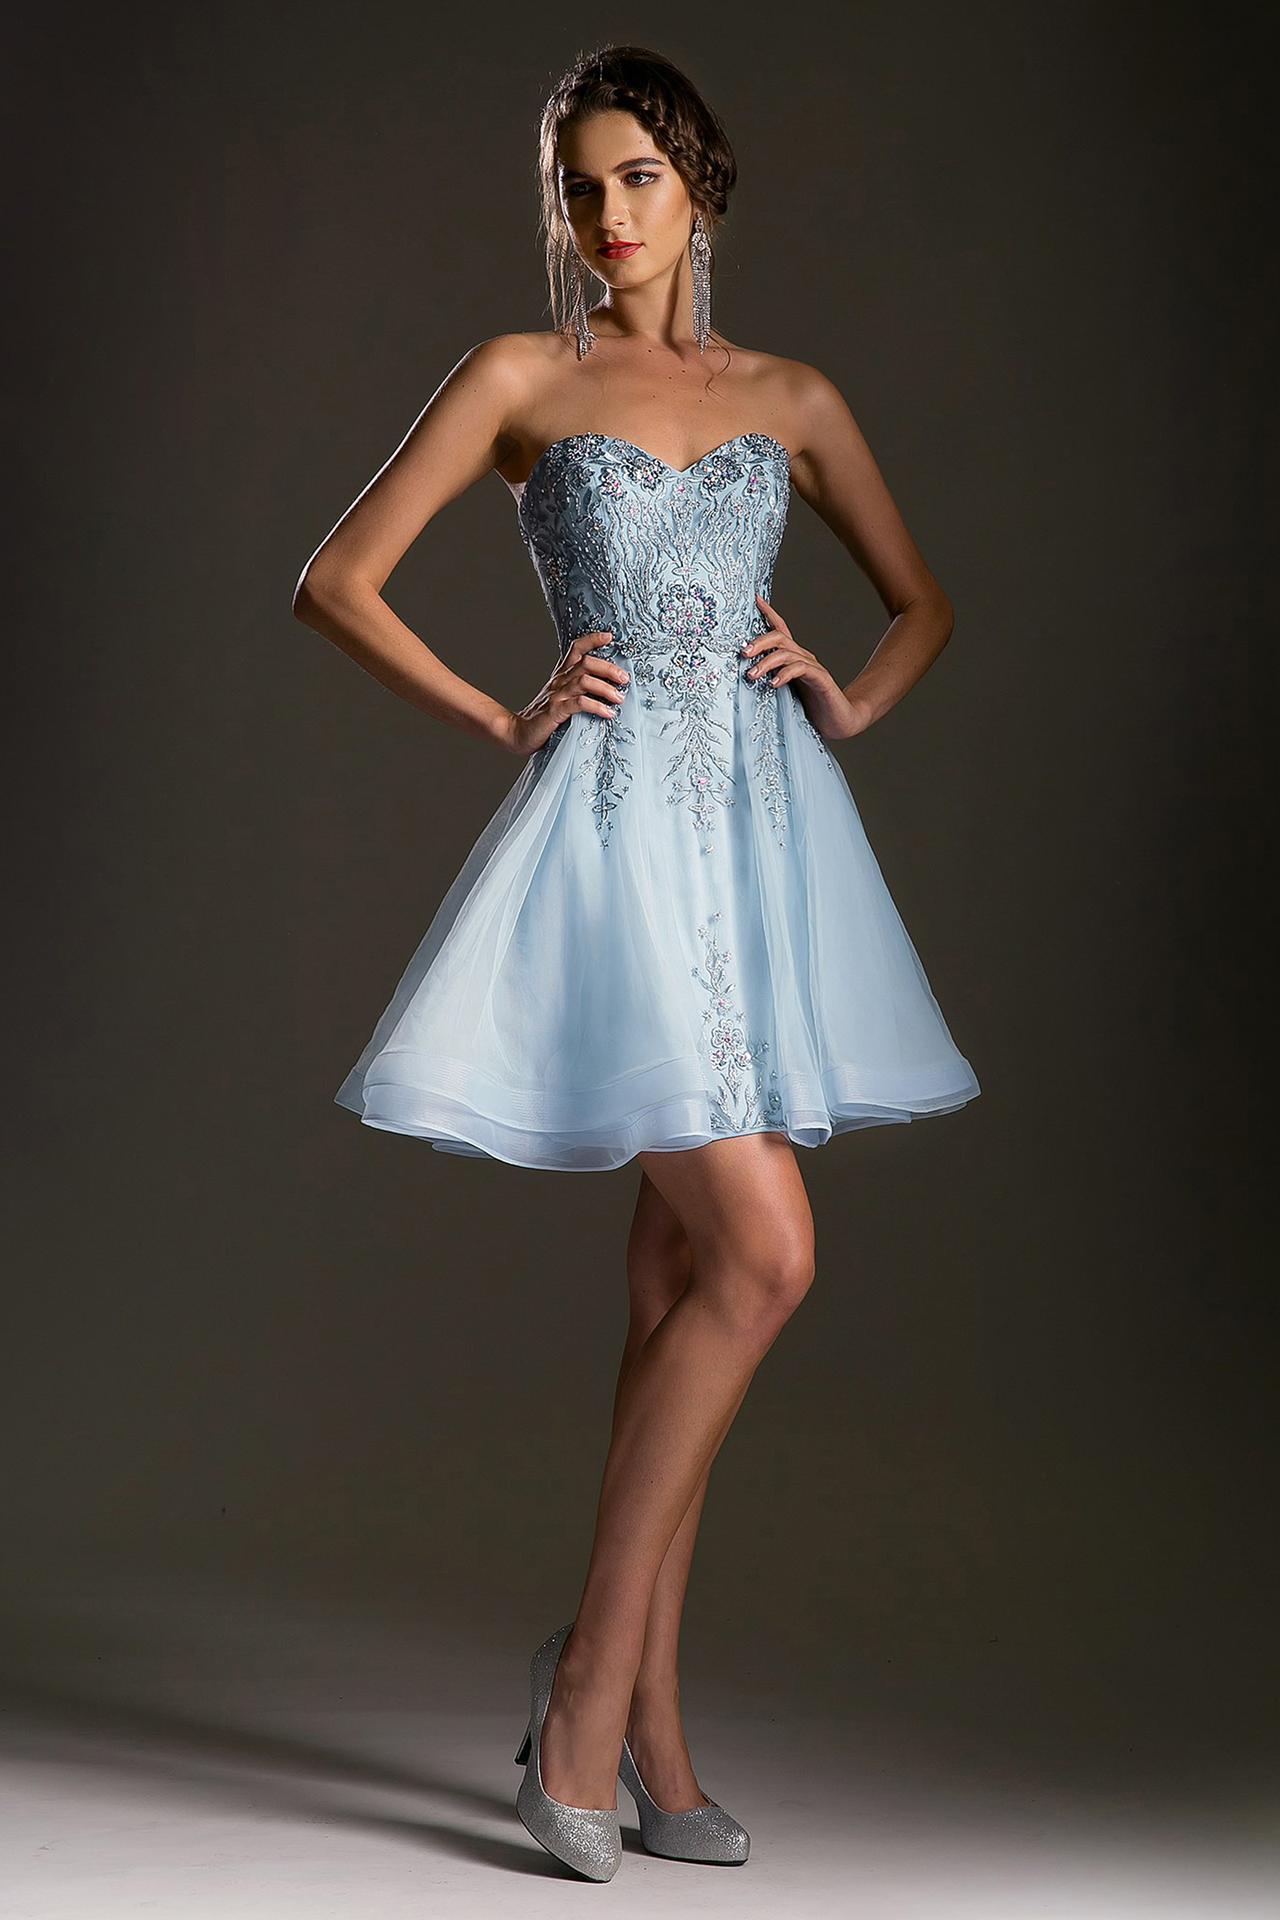 Nové spoločenské šaty :) - Obrázok č. 67